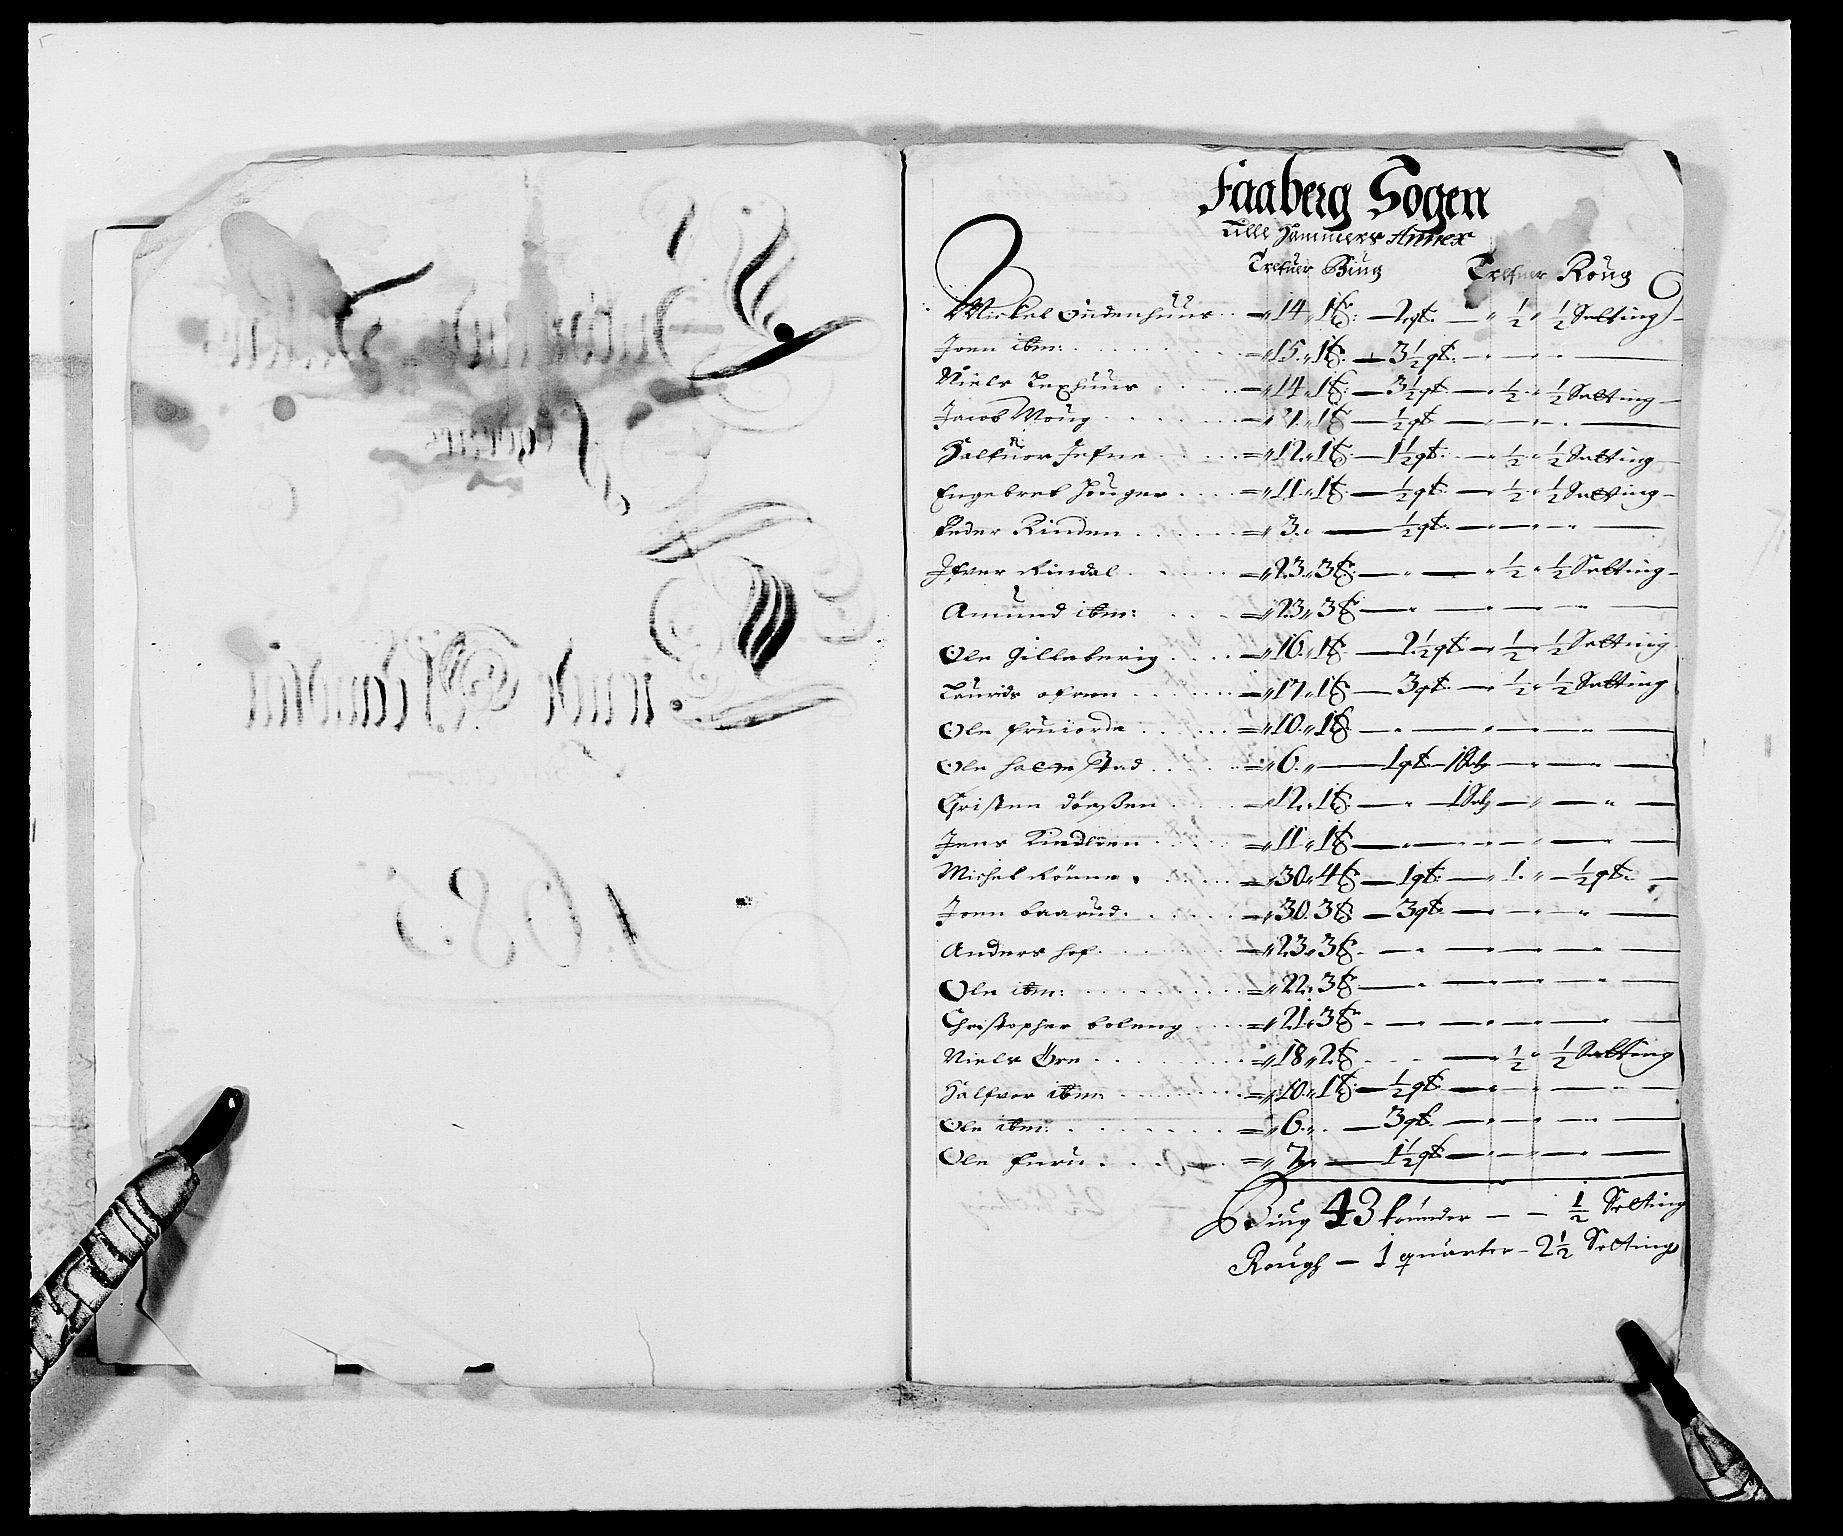 RA, Rentekammeret inntil 1814, Reviderte regnskaper, Fogderegnskap, R17/L1160: Fogderegnskap Gudbrandsdal, 1682-1689, s. 16